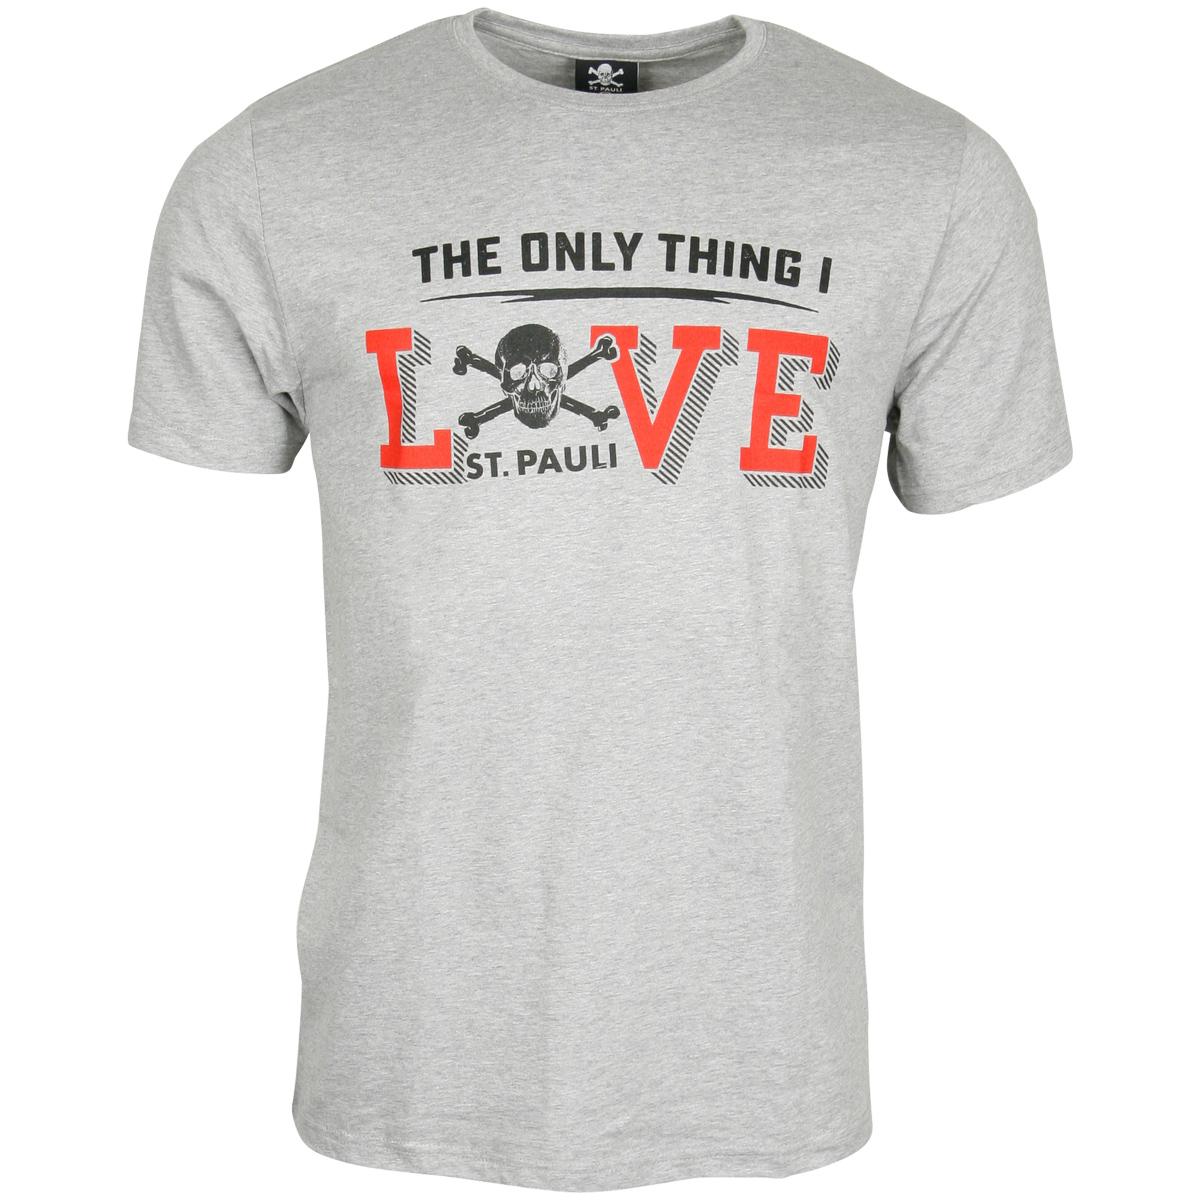 FC St. Pauli - T-Shirt Love - grau